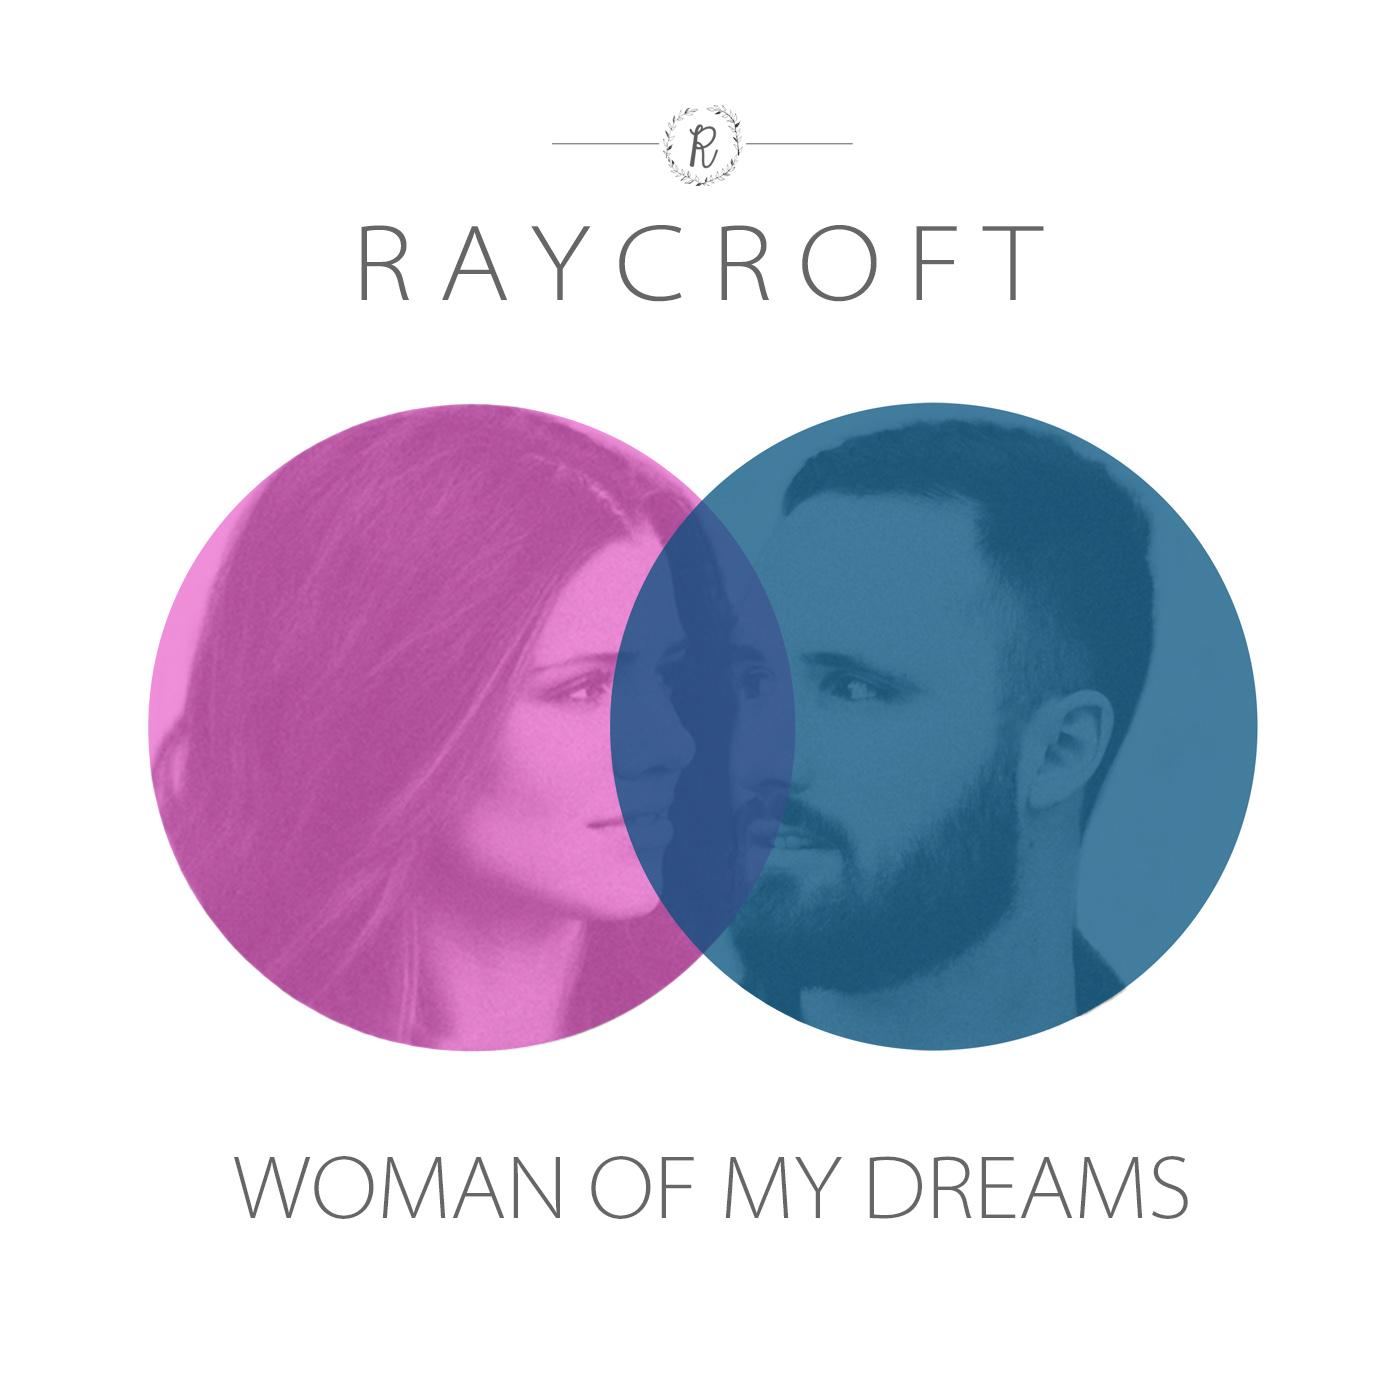 Jordan Raycroft Danielle Raycroft Woman of My Dreams